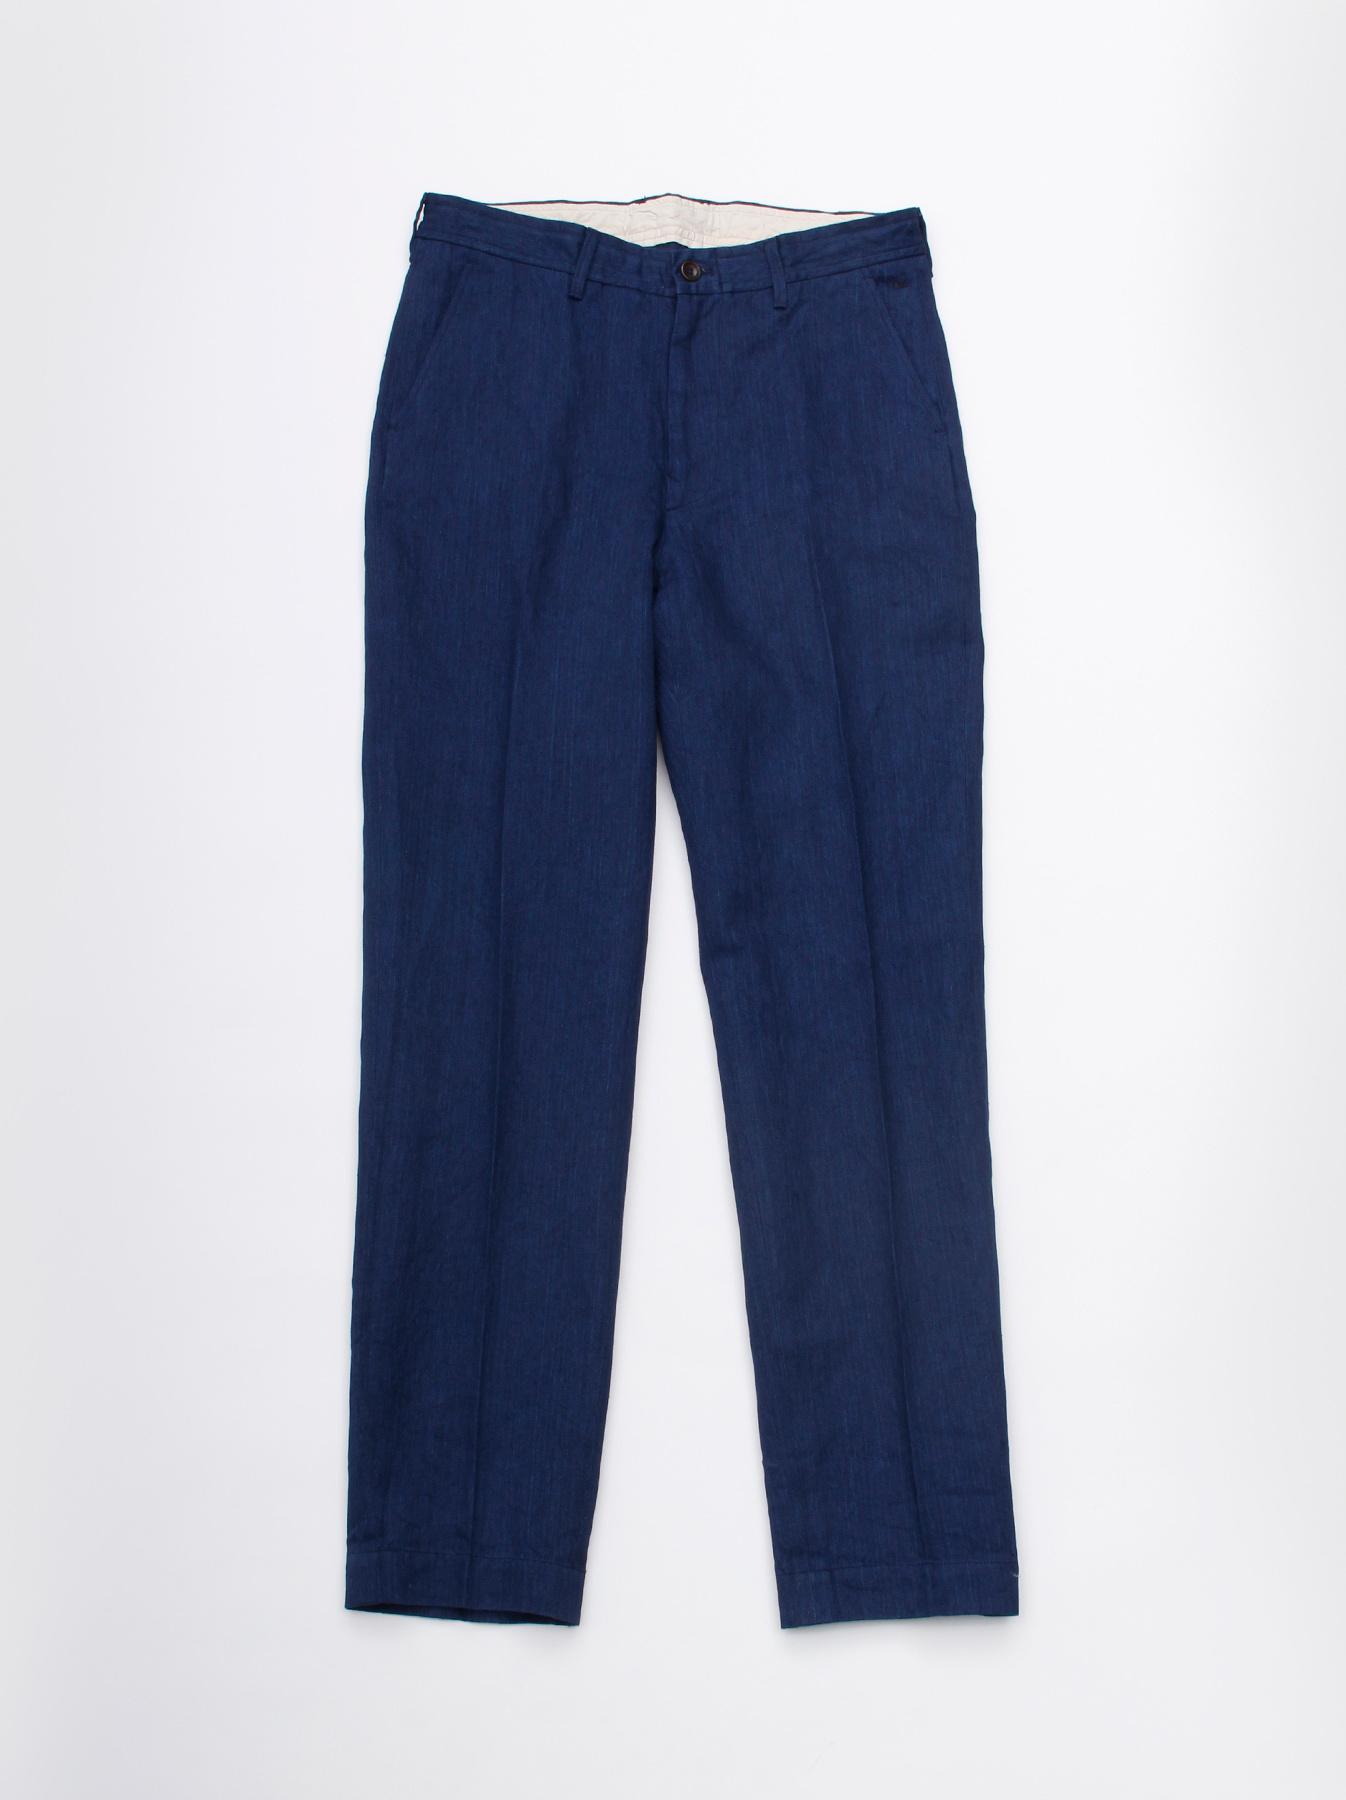 WH Indigo Linen Easy Slacks-1